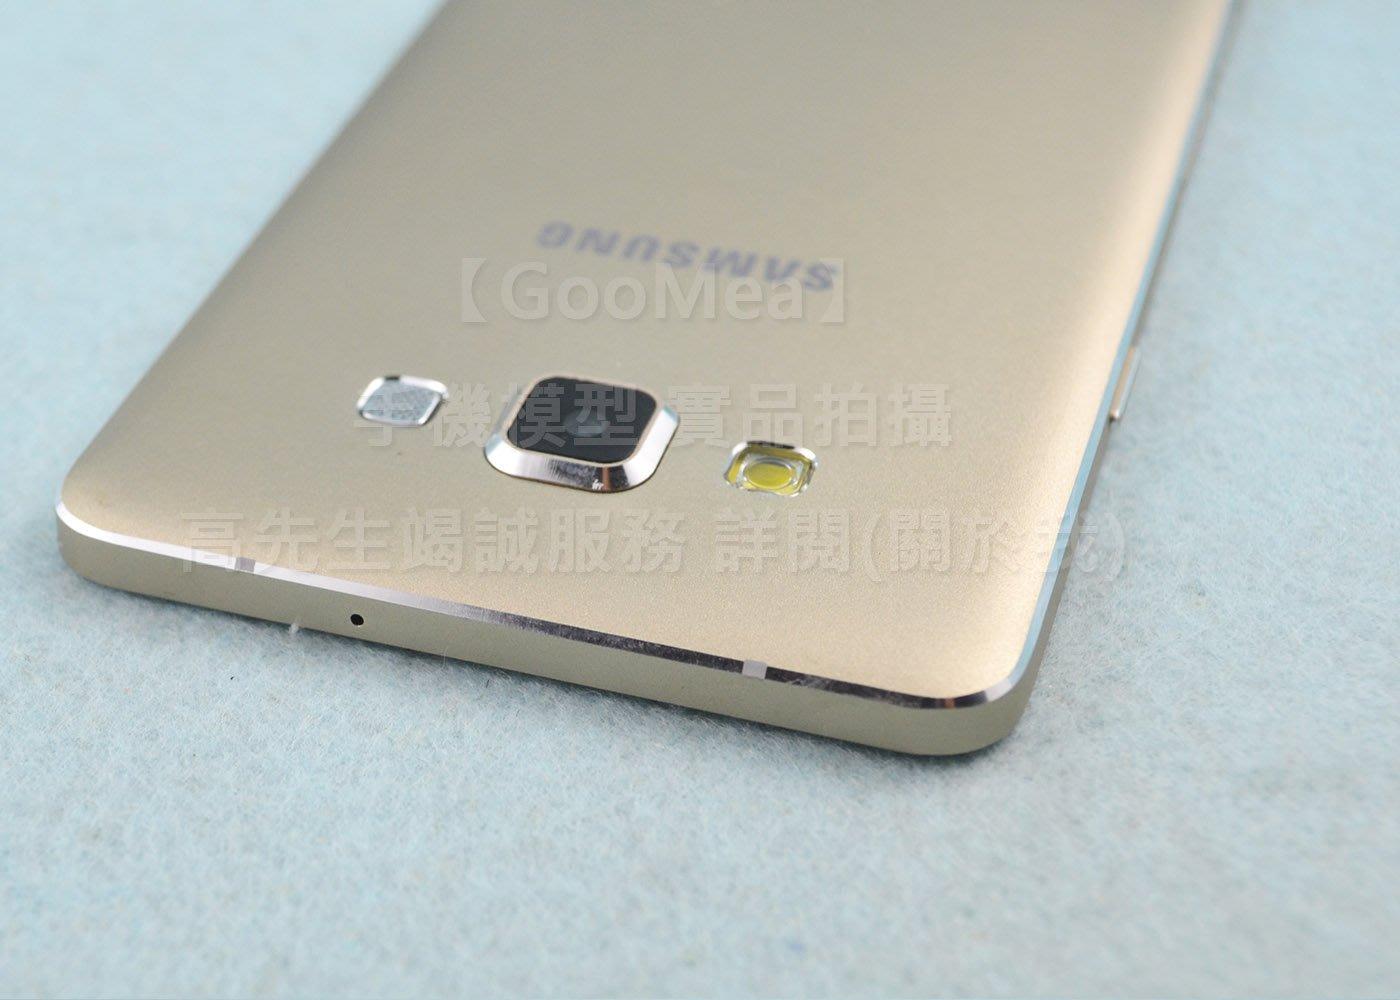 【GooMea】原裝 黑屏Samsung三星Galaxy A7 2015模型展示樣品包膜dummy摔機整人假機交差1:1